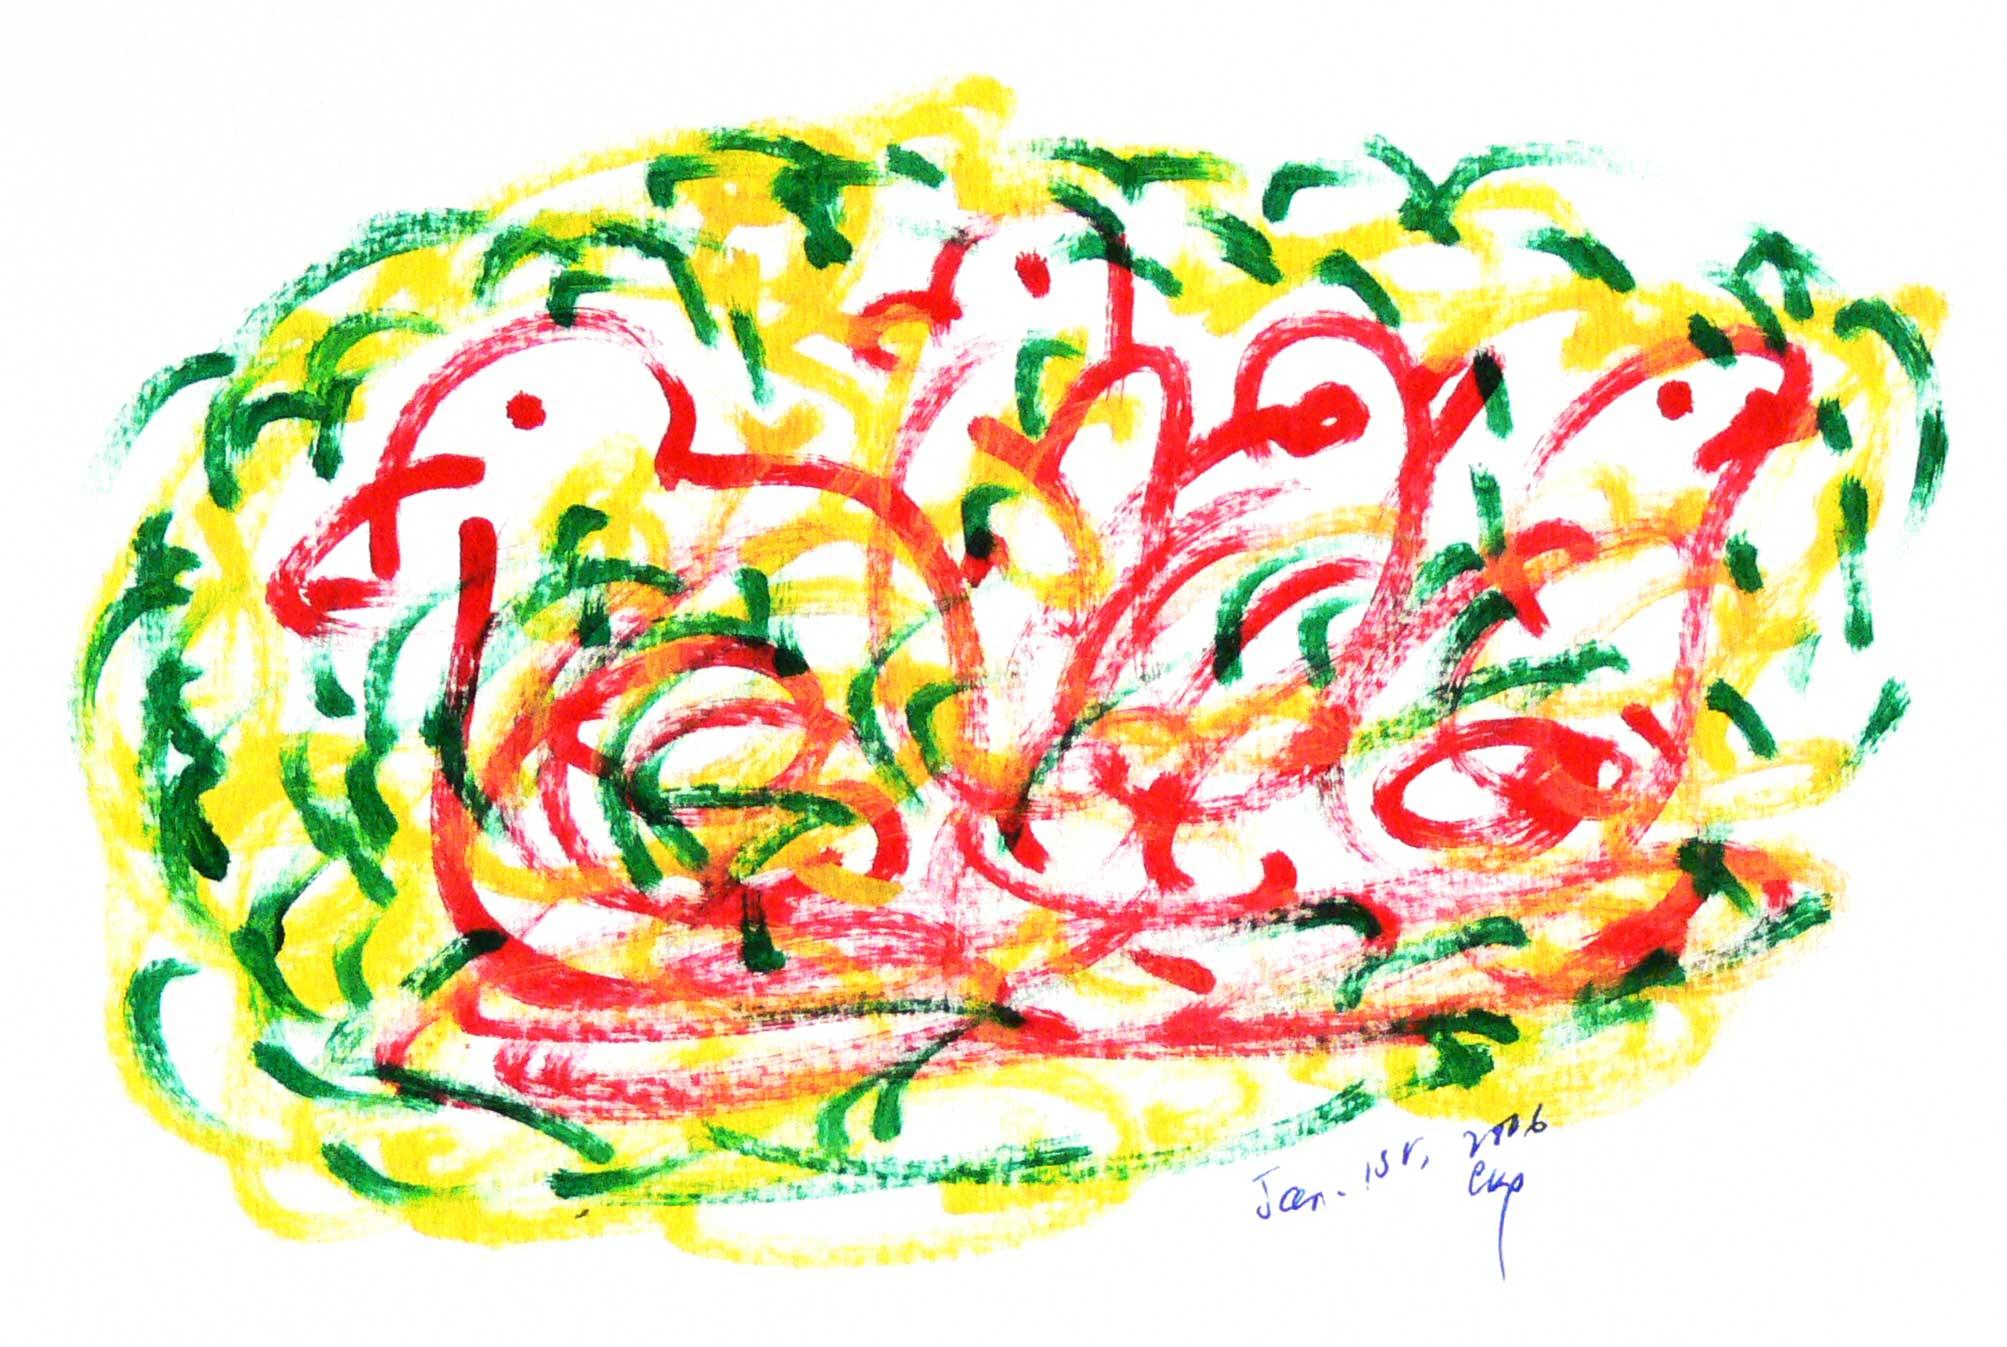 _Bird-Drawing-by-Sri-Chinmoy-1-1-2006-7